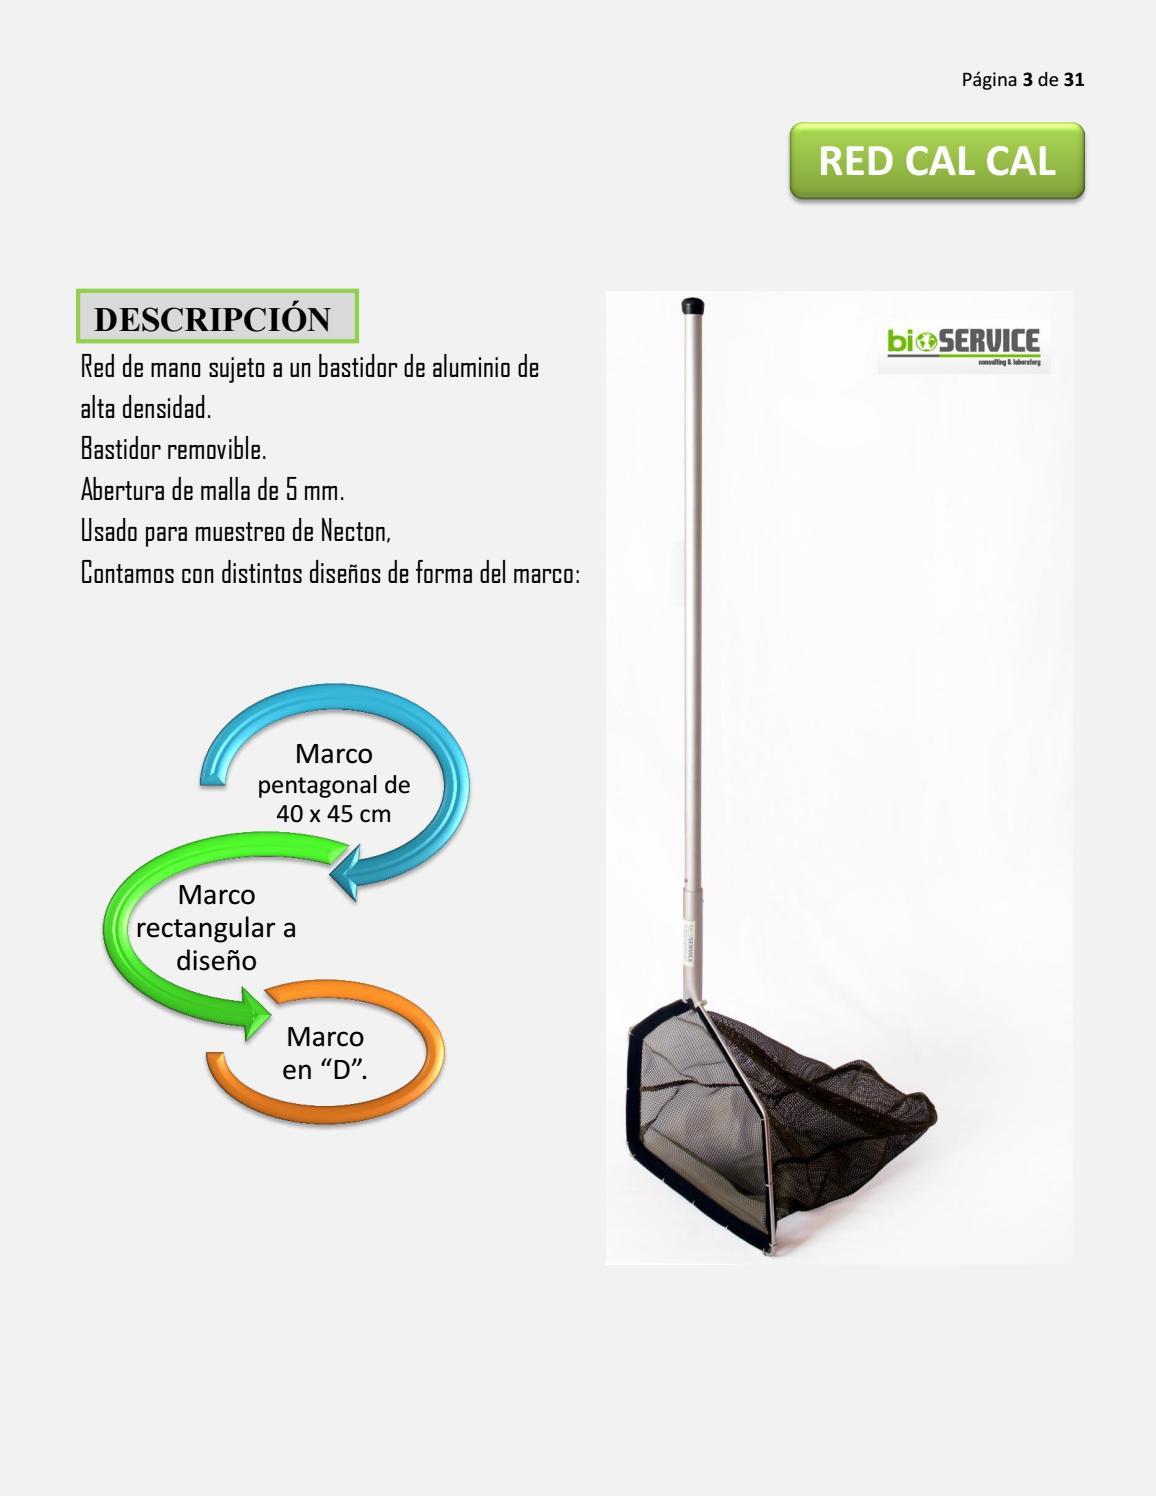 Catalogo 2016 IV BIOSERVICE CLAB by Edson Castillo - issuu